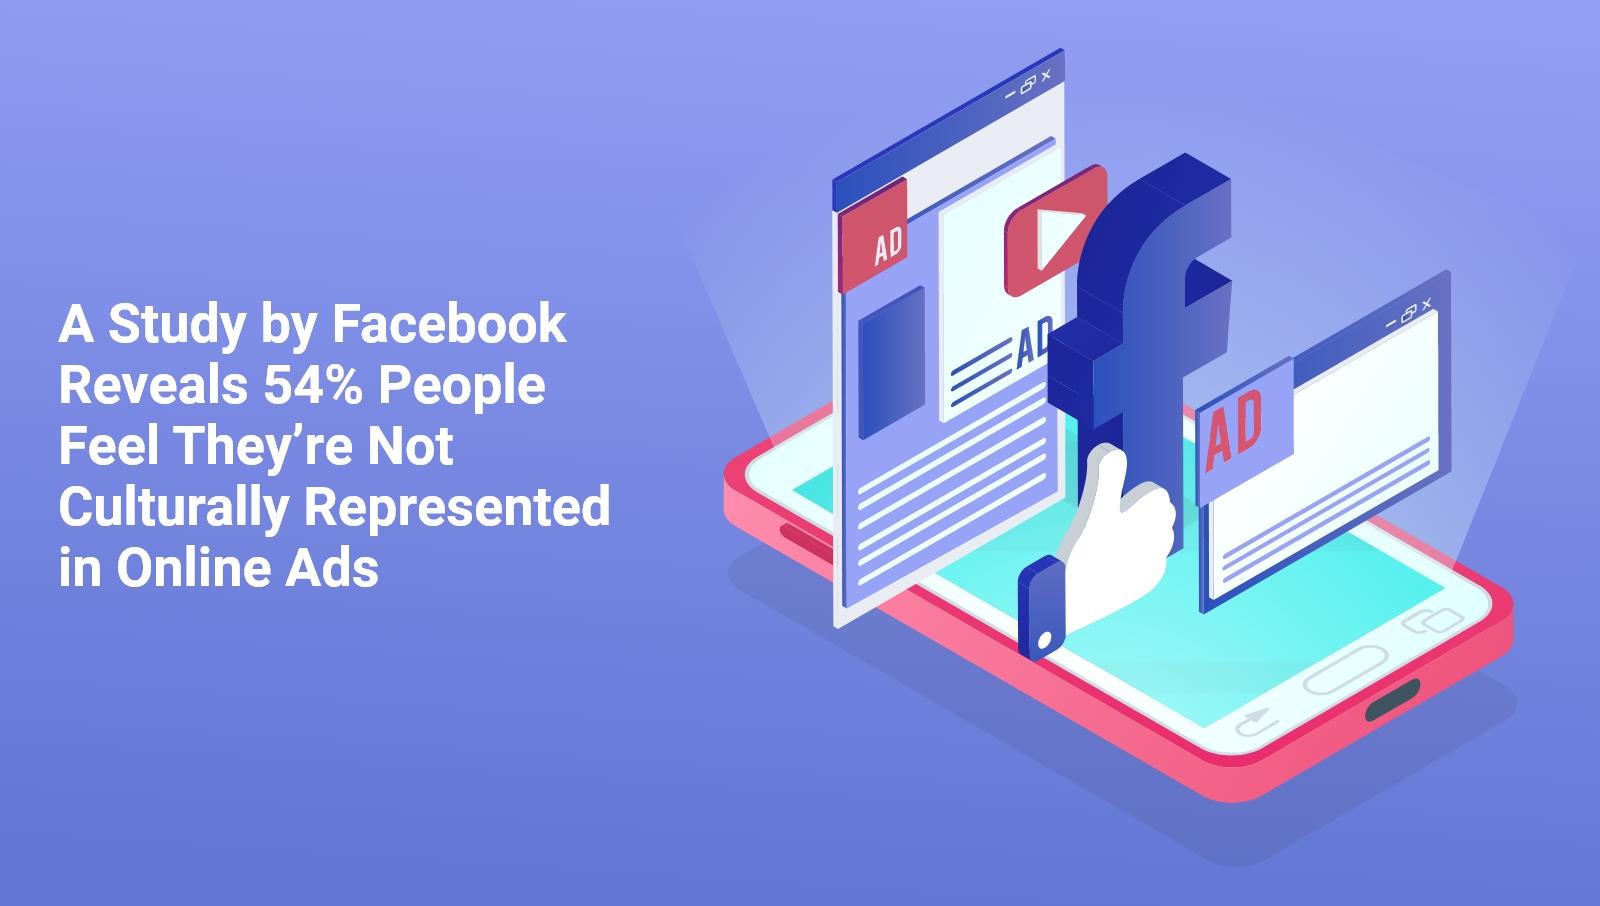 Facebook-study-reveals-cultural-underrepresentation